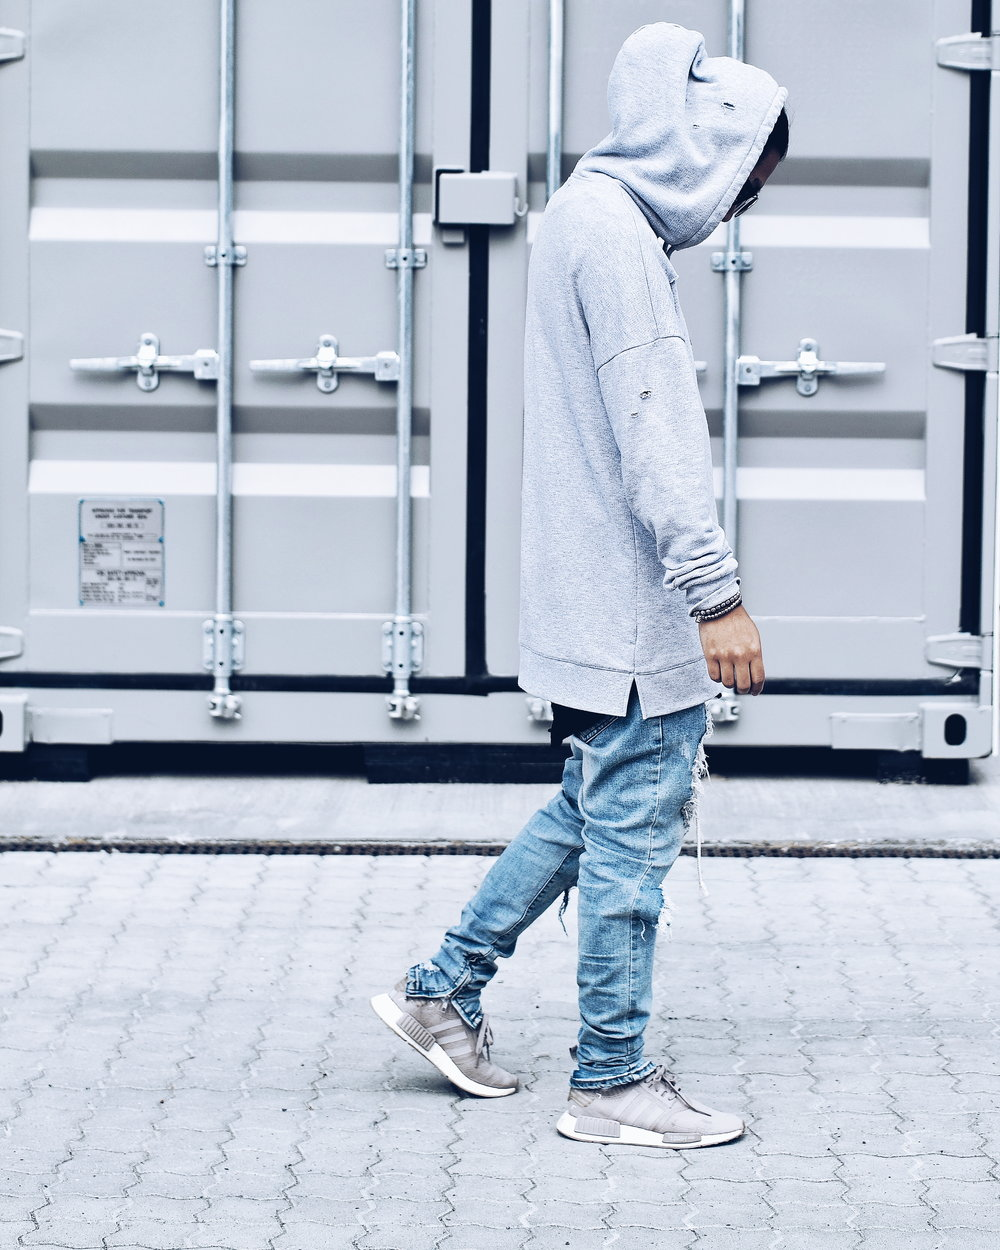 Men's Summer Streetwear,Men's Summer Street Style,Fashion From Norway,Thai Fashion Blogger,July Fashion,Summer Fashion Inspiration,Men's Street Outfits,European Street Style,Teddy Upacut 7